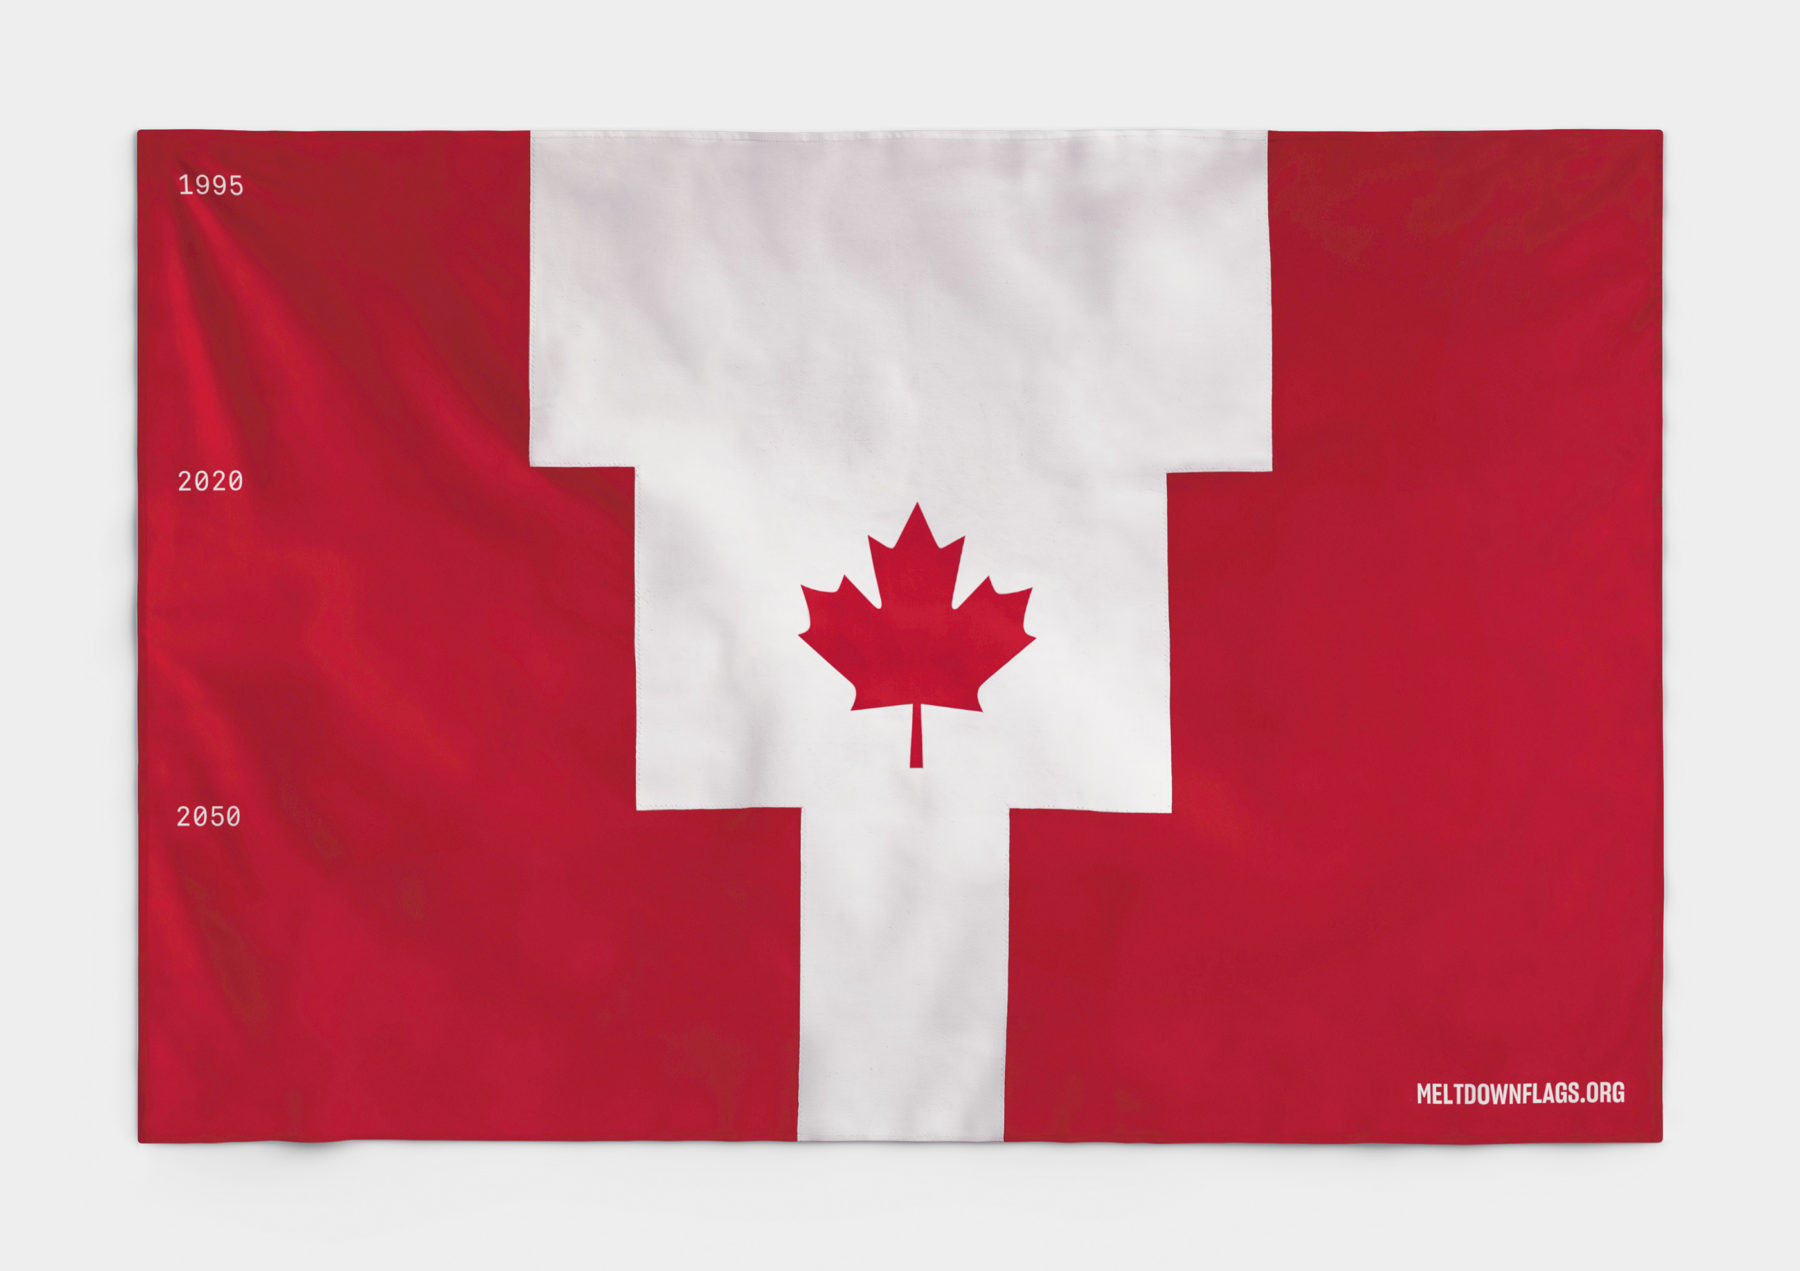 meltdown flags 10